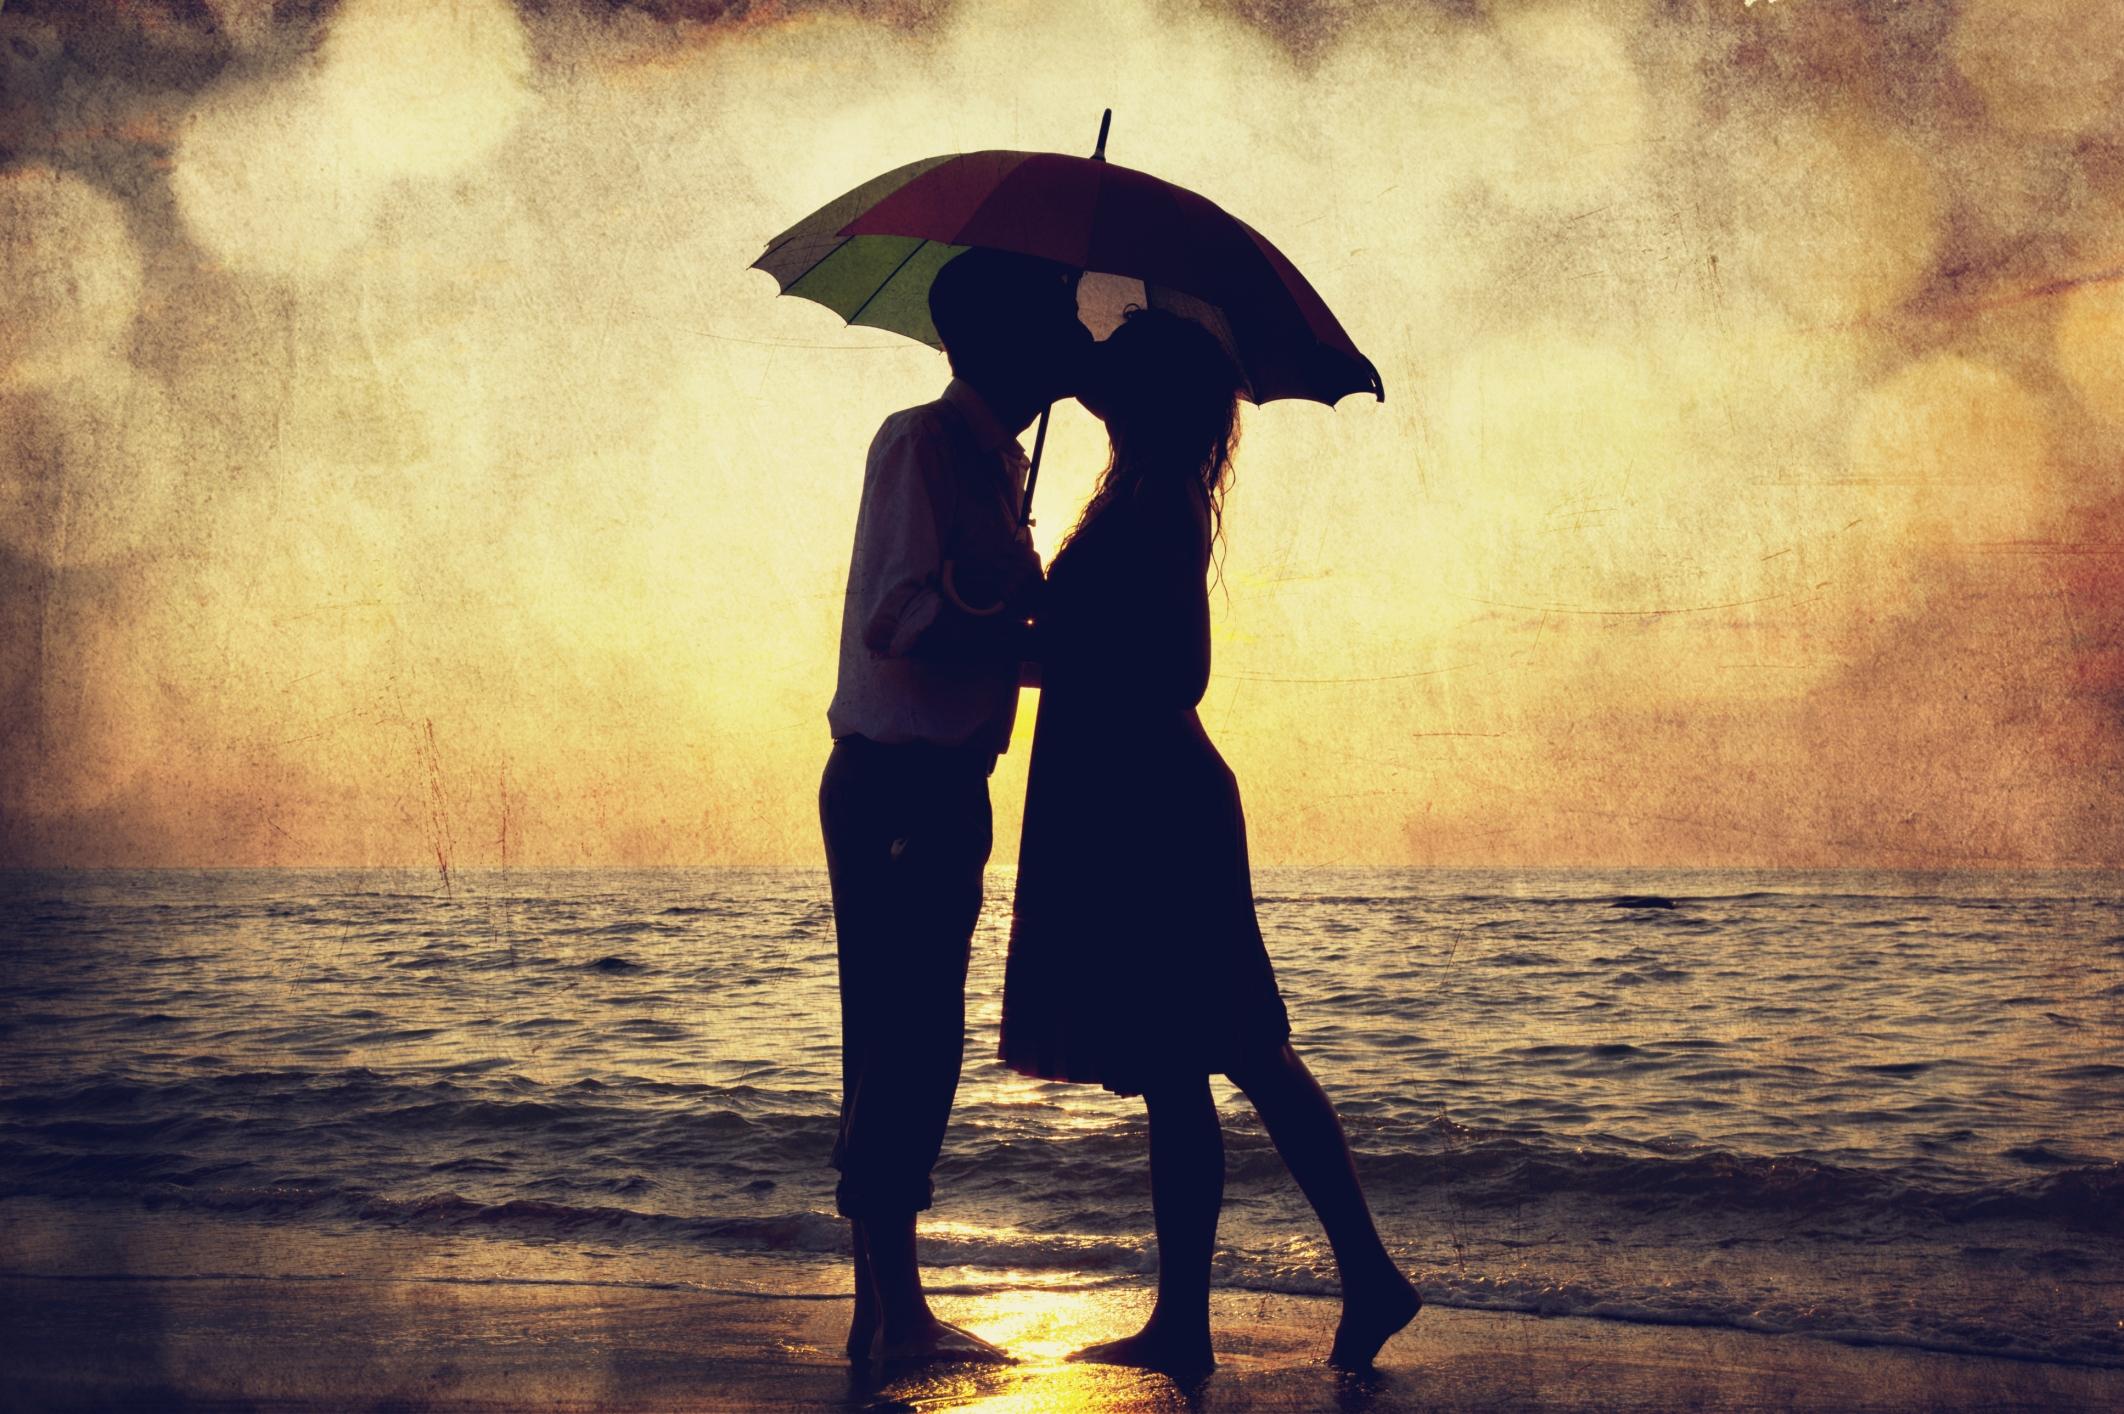 Images of Romance | 2124x1414